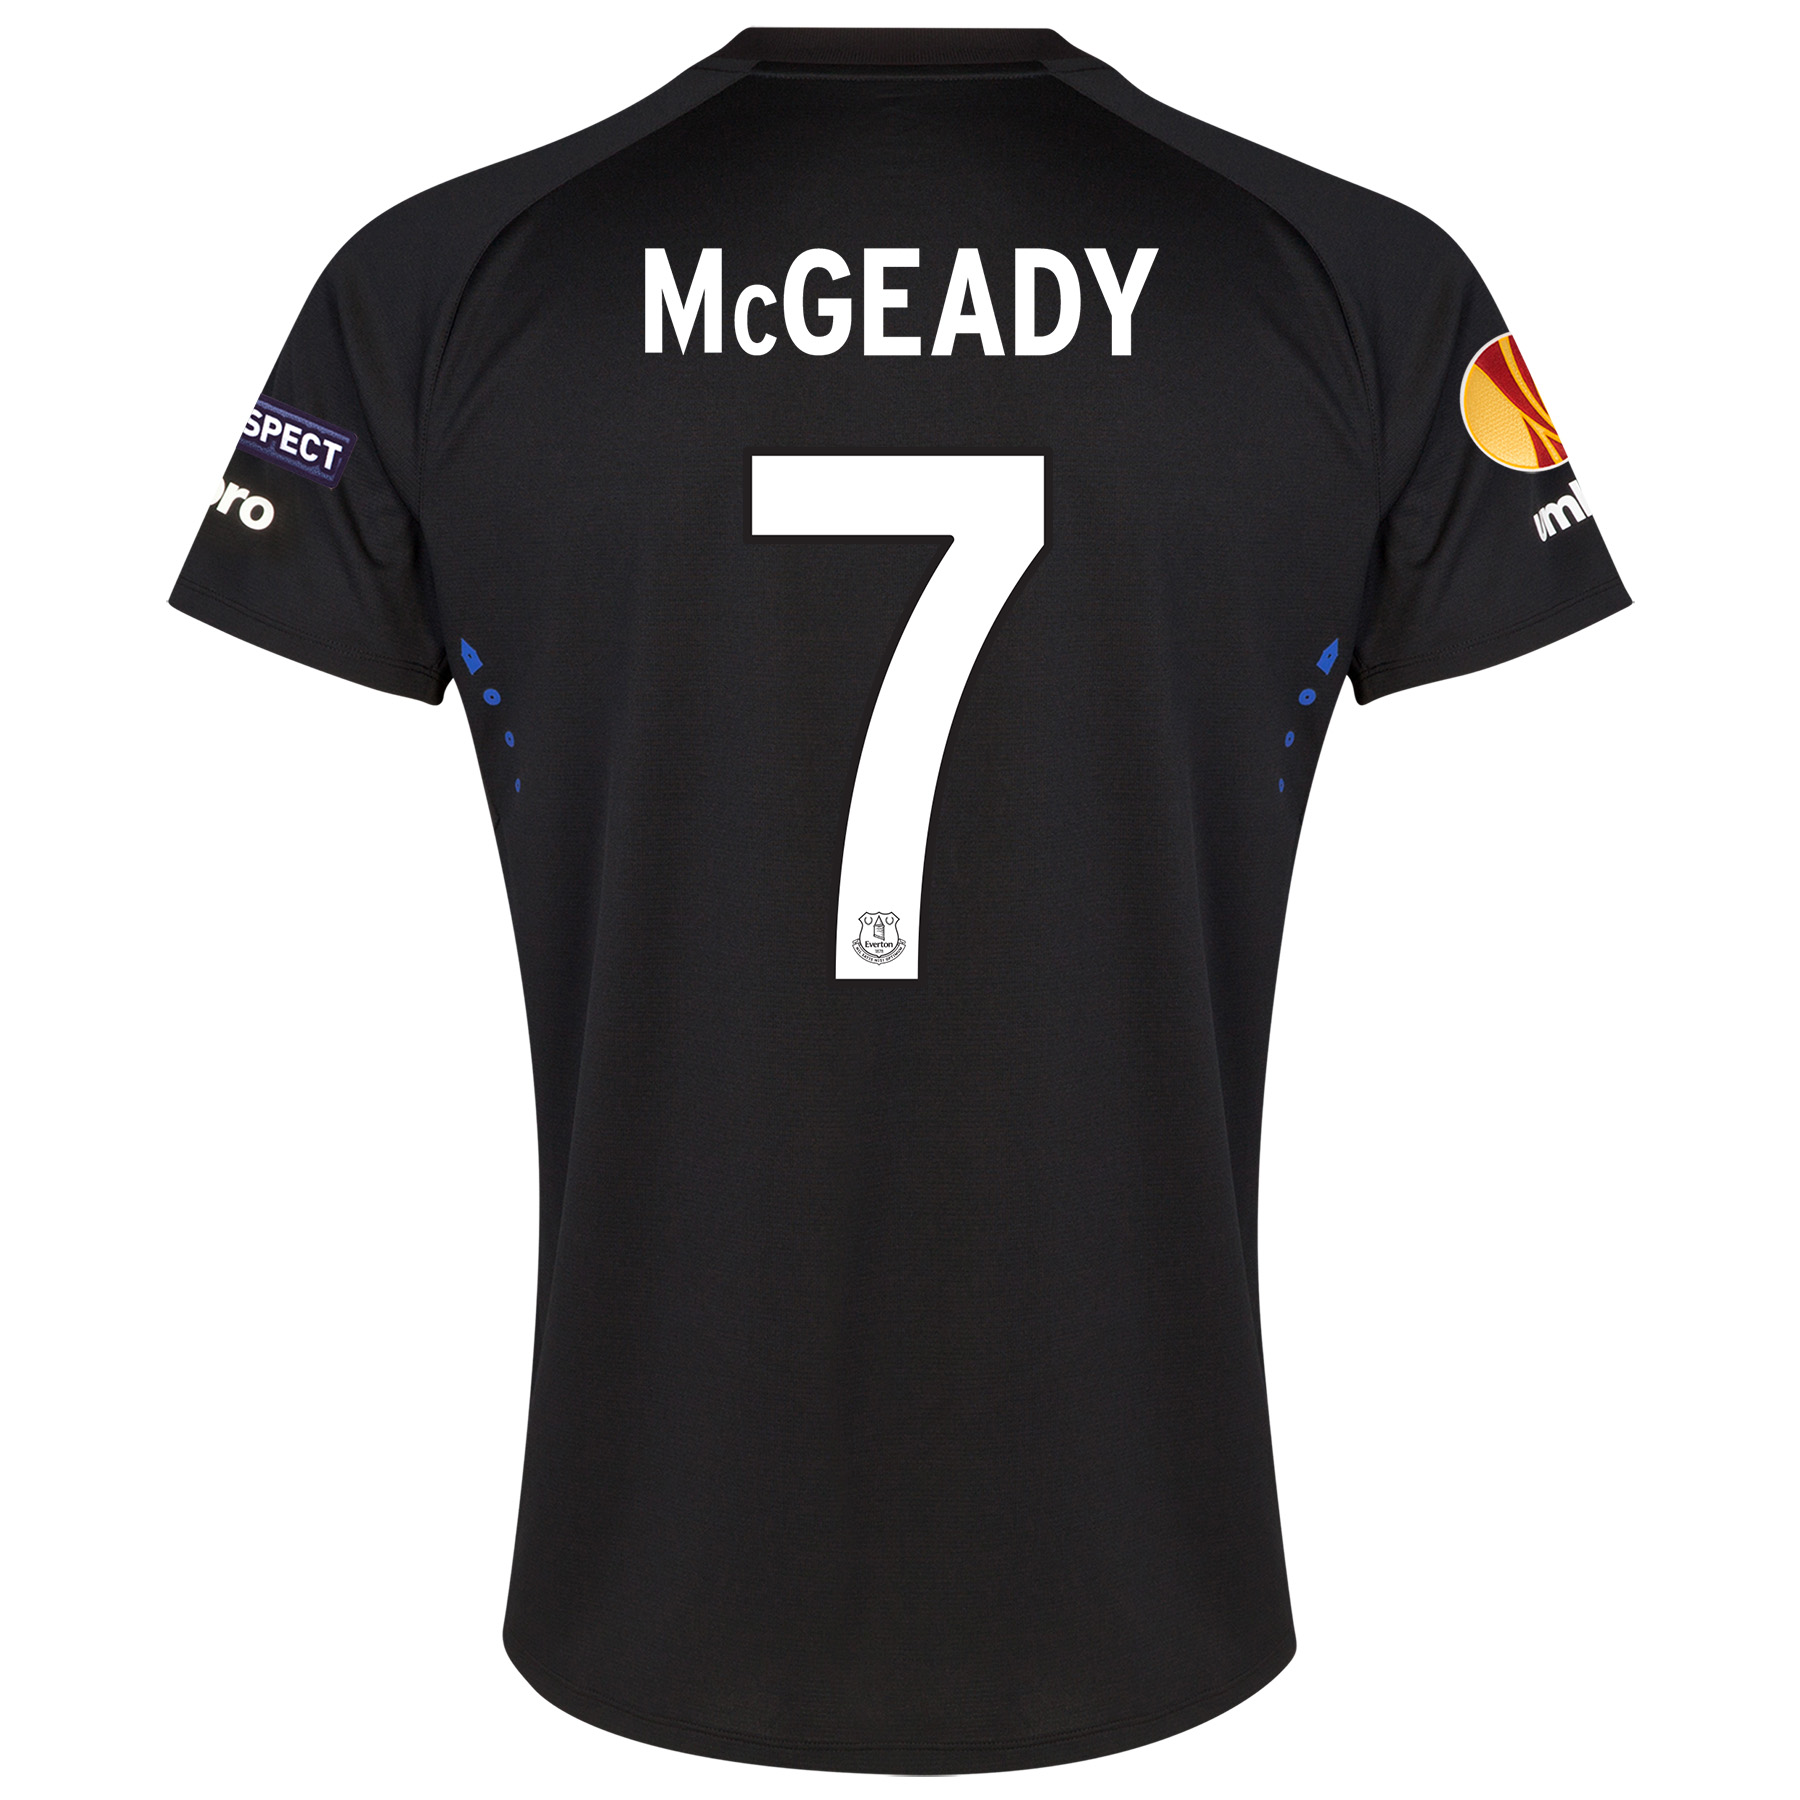 Everton UEFA Europa League Away Shirt 2014/15 with McGeady 7 printing